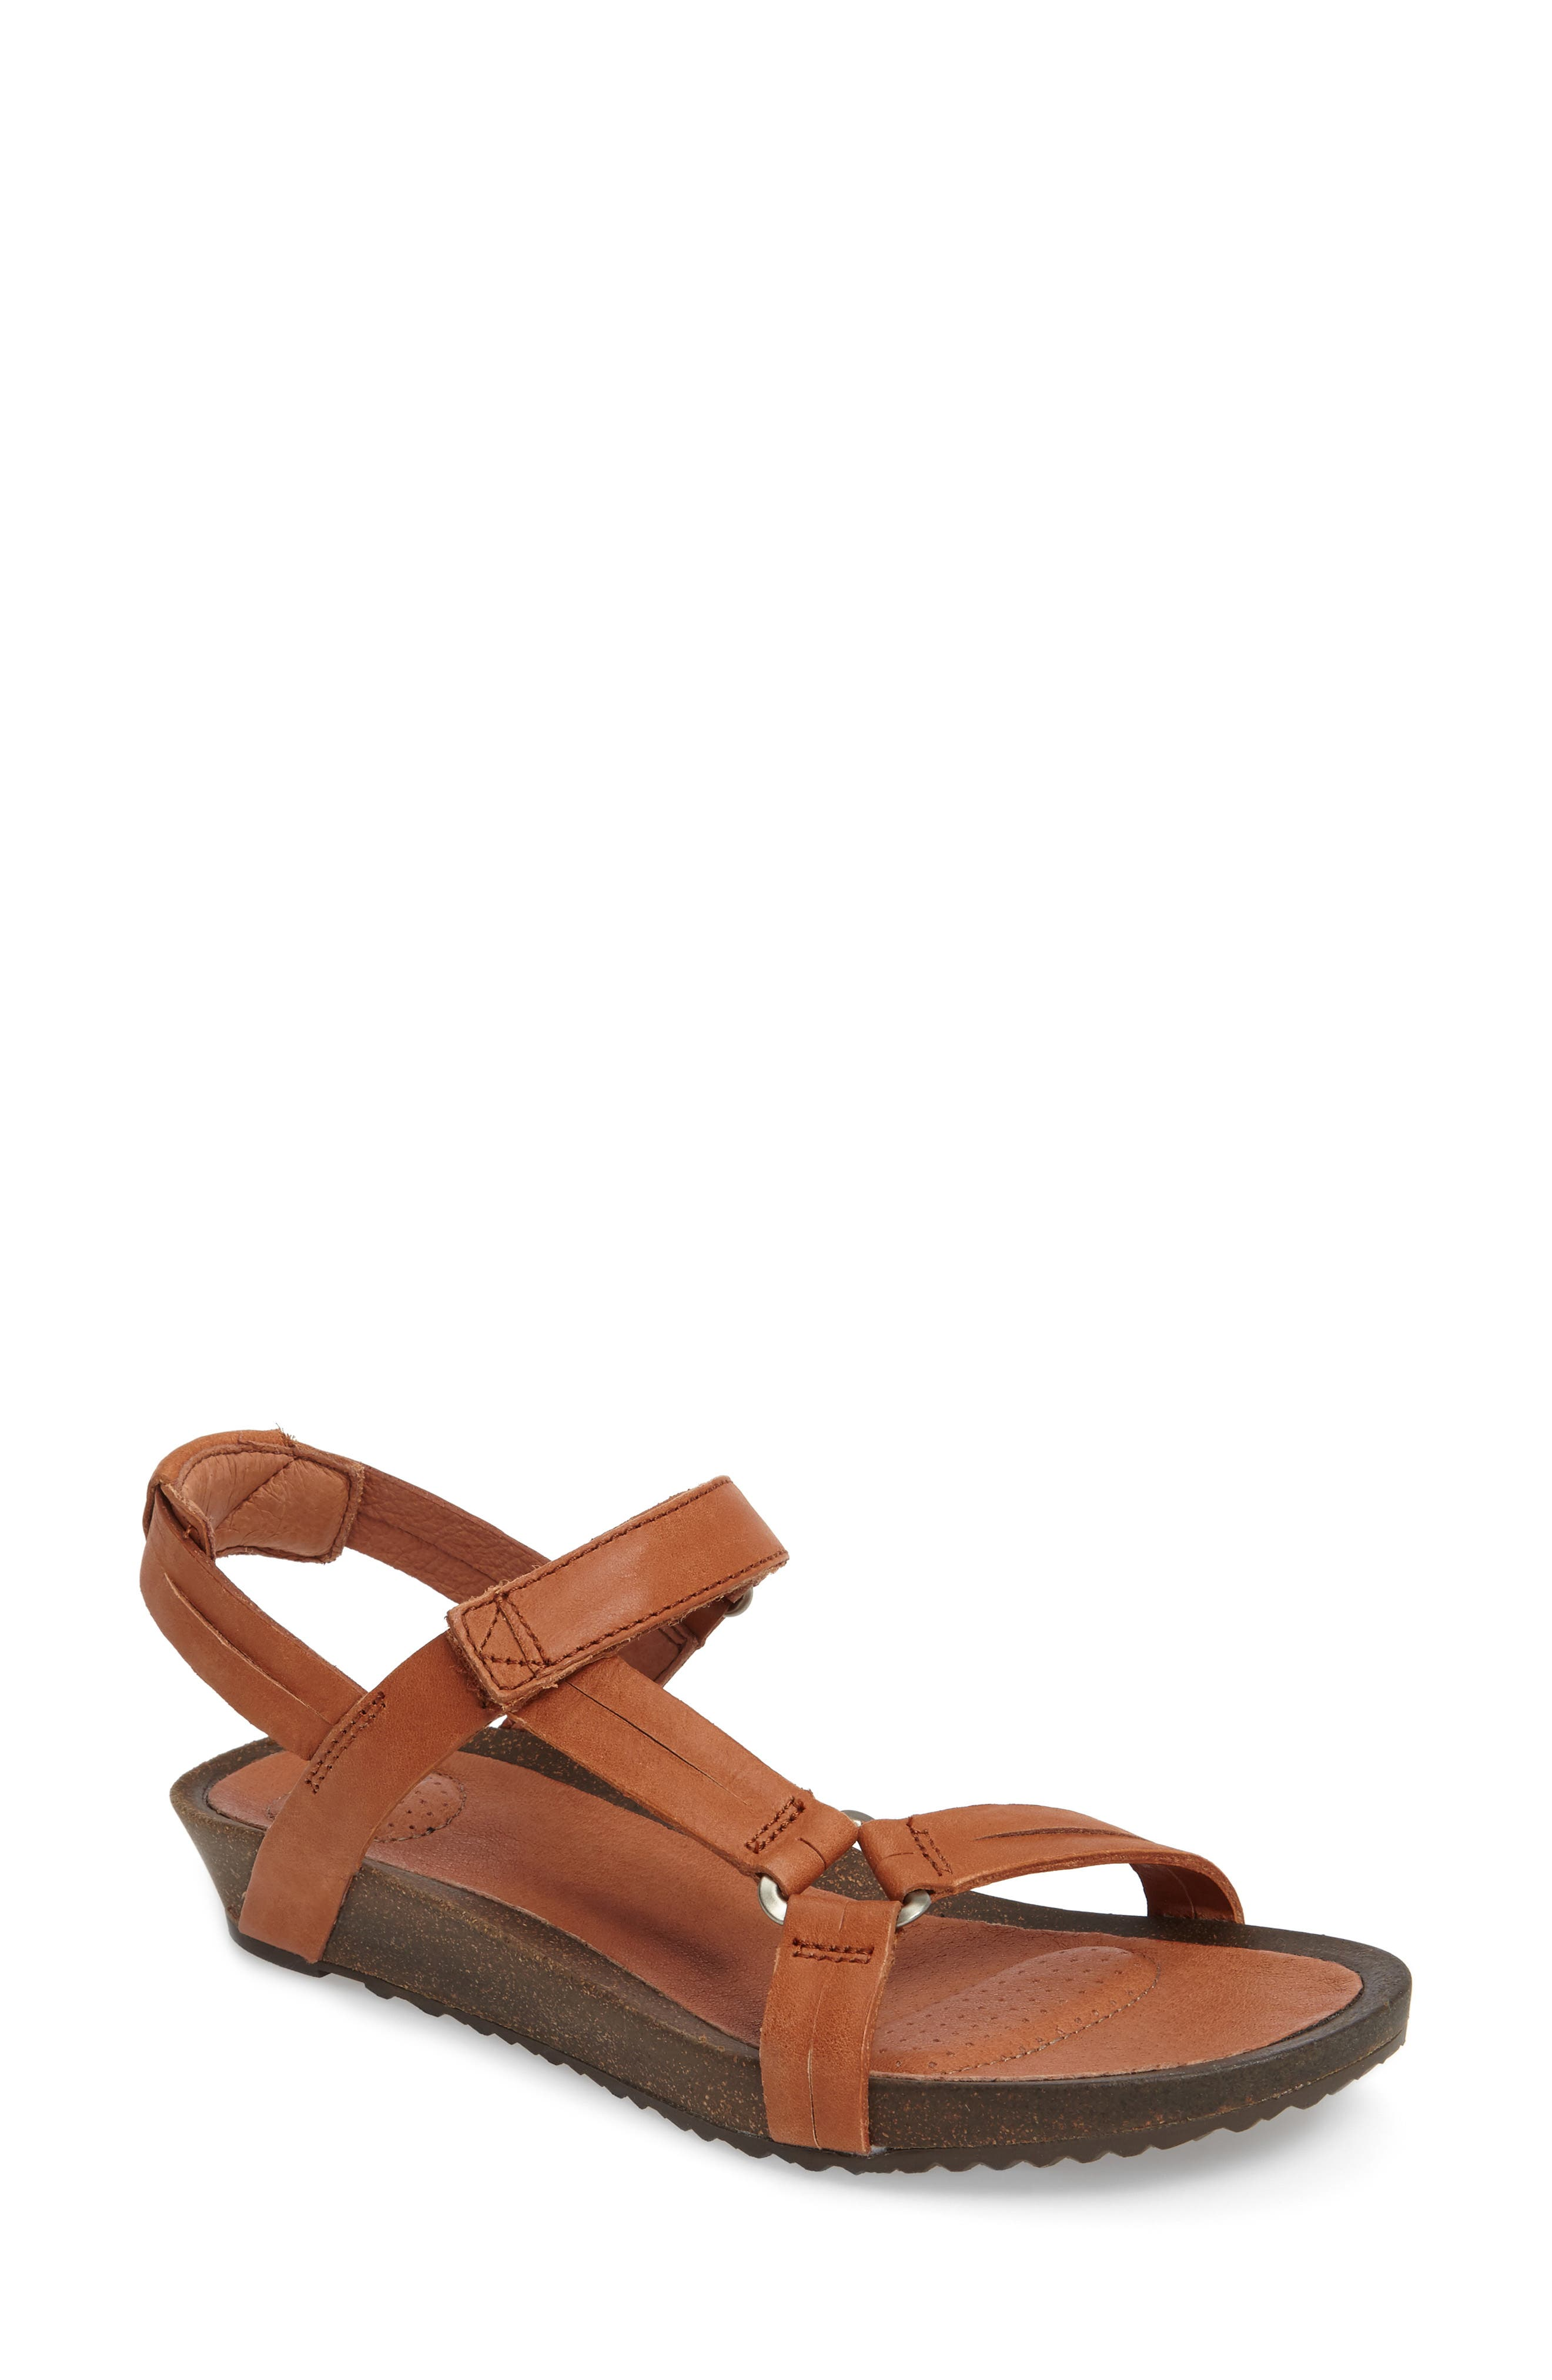 Ysidro Universal Sandal,                             Main thumbnail 1, color,                             Cognac Leather